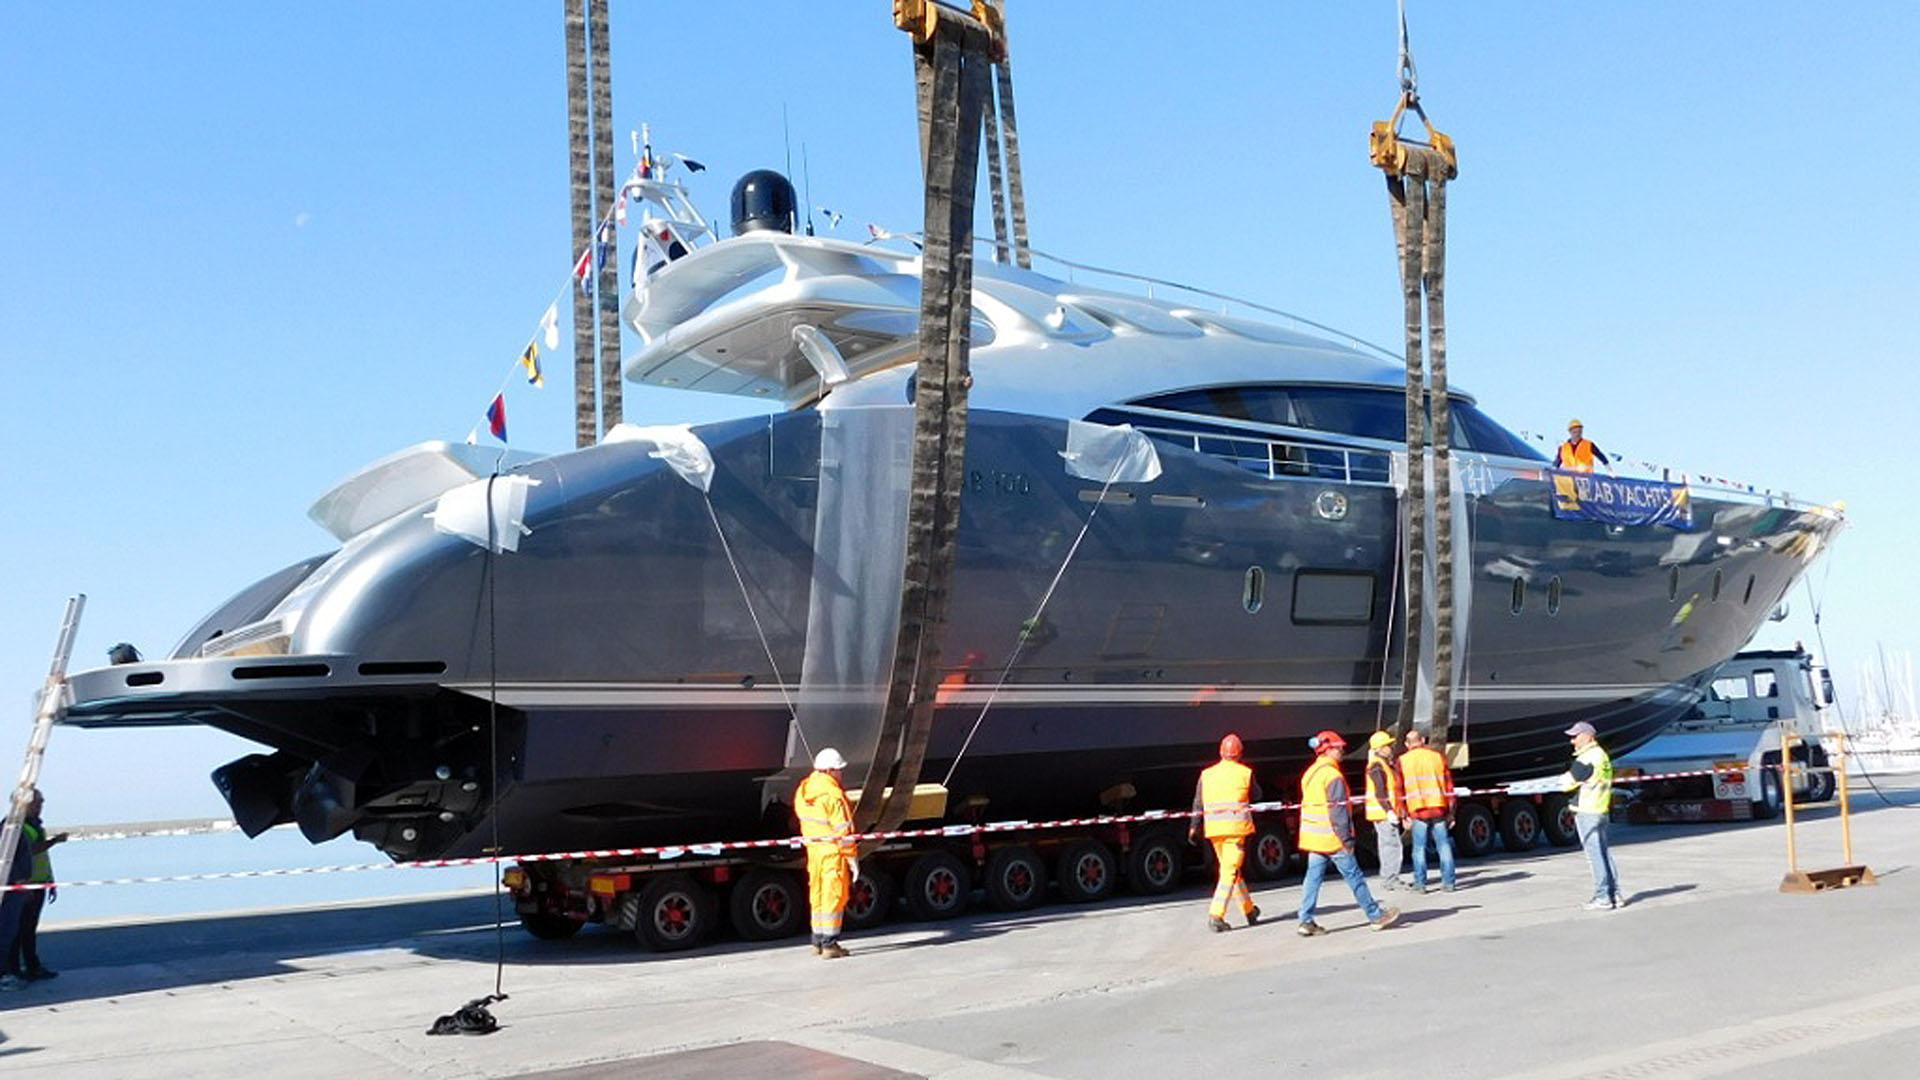 ab-100-motor-yacht-2016-30m-half-profile-stern-launch